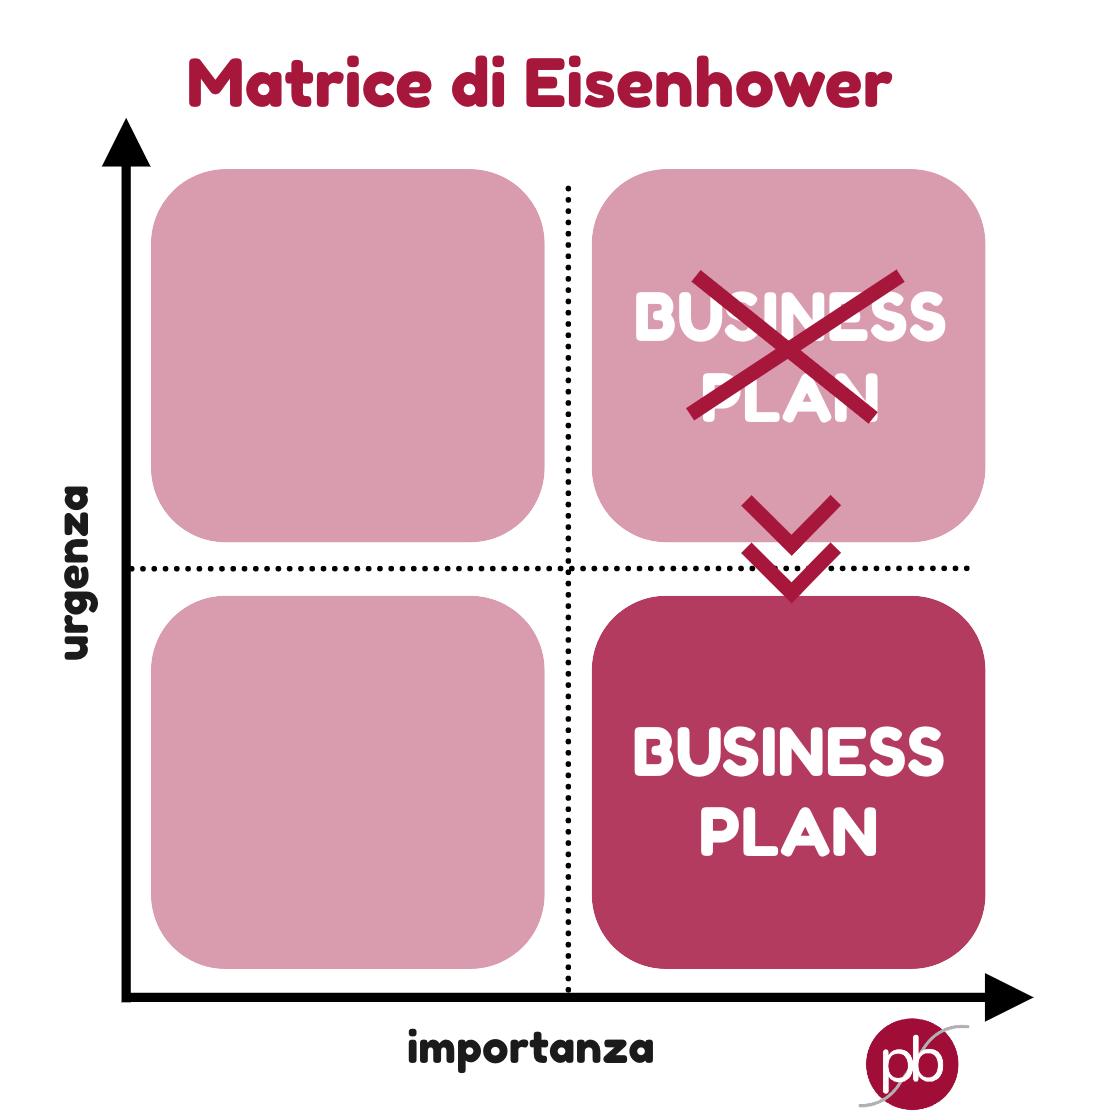 matrice-eisenhower-priorità-organizzazione-urgenza-pianobis-businessplan